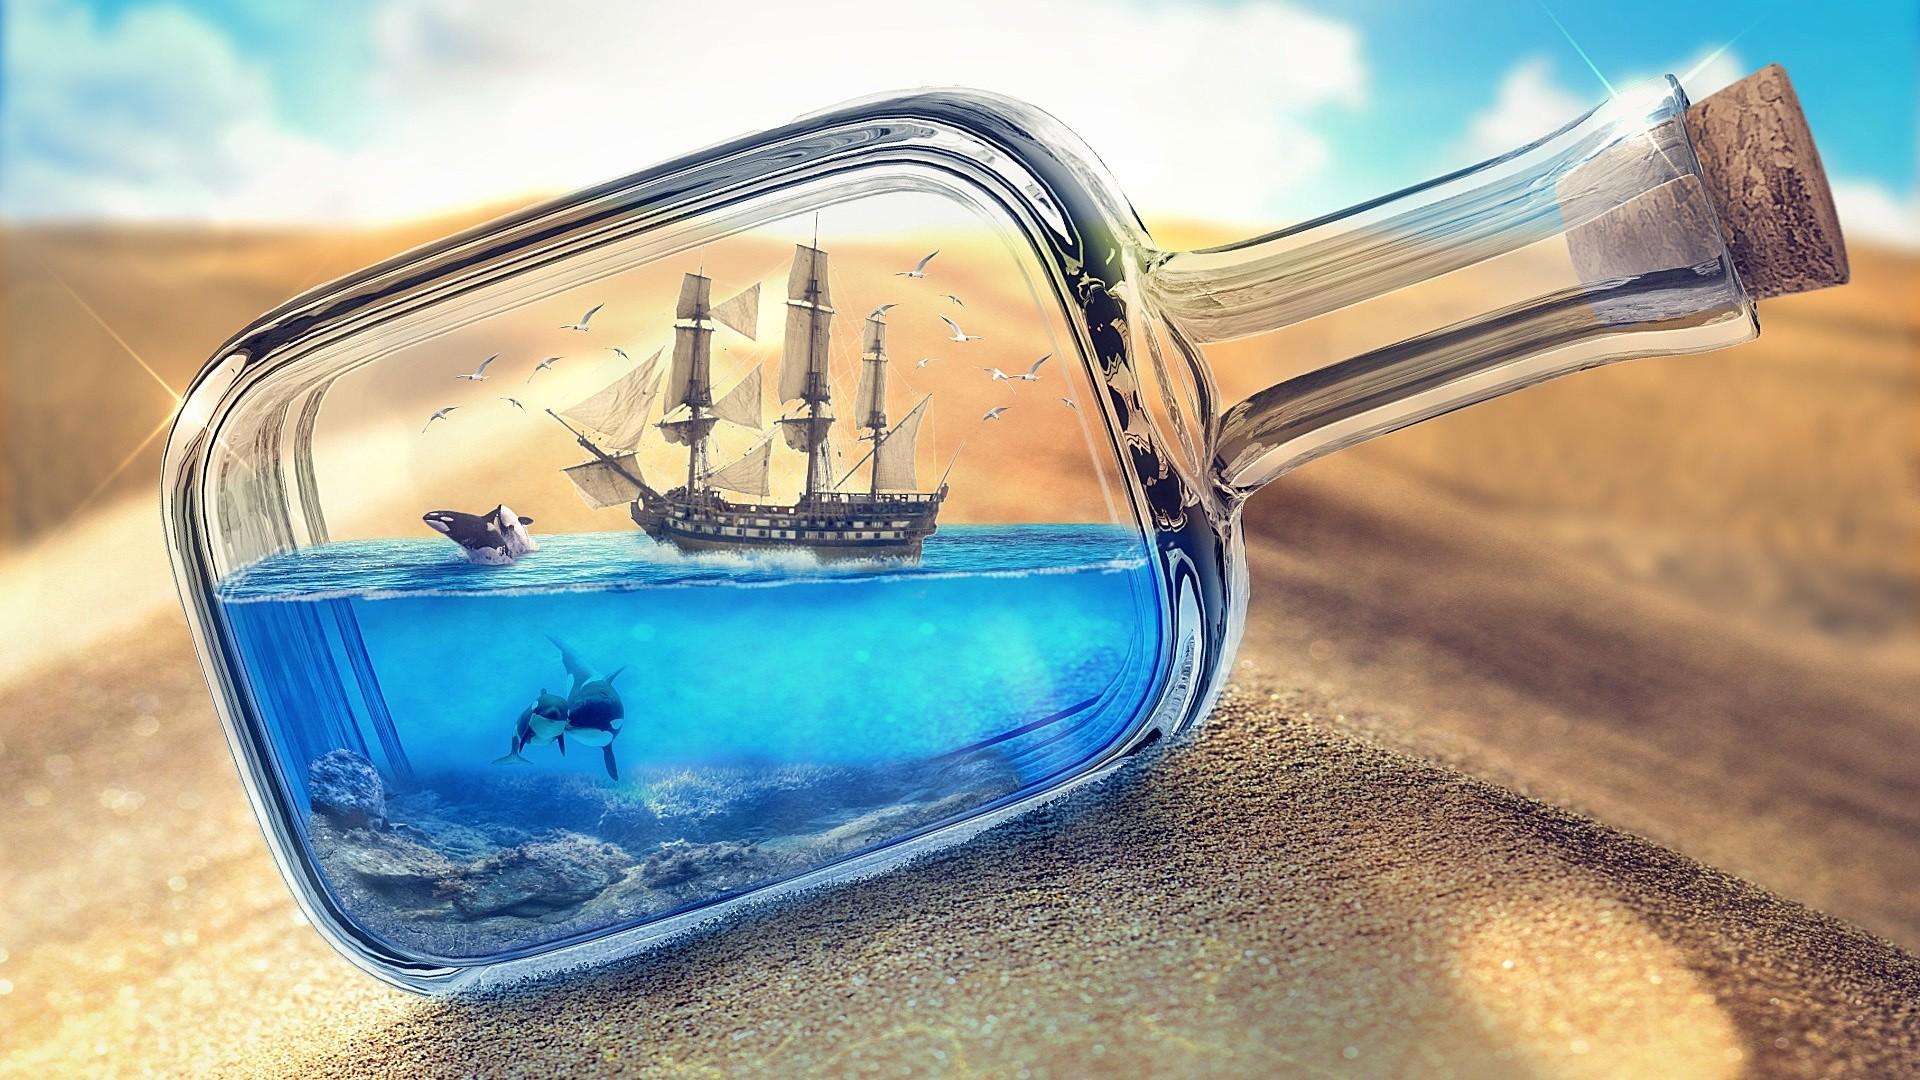 Ship In A Bottle Download Wallpaper